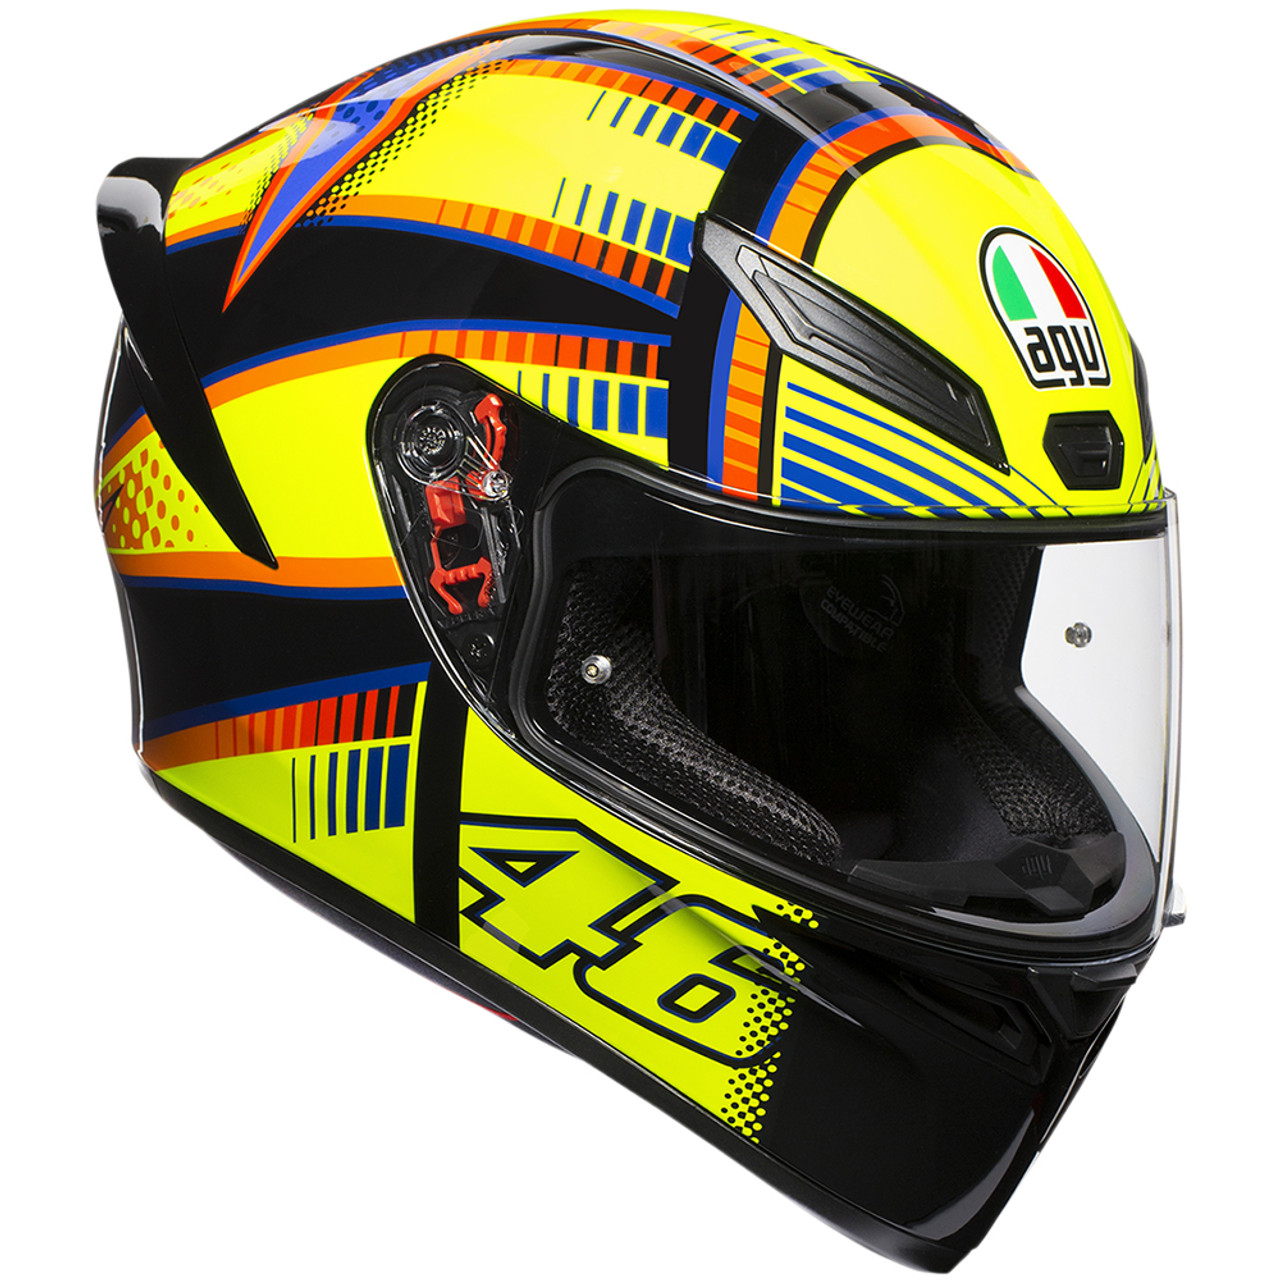 Agv K1 Soleluna 2015 Helmet Sportbike Track Gear